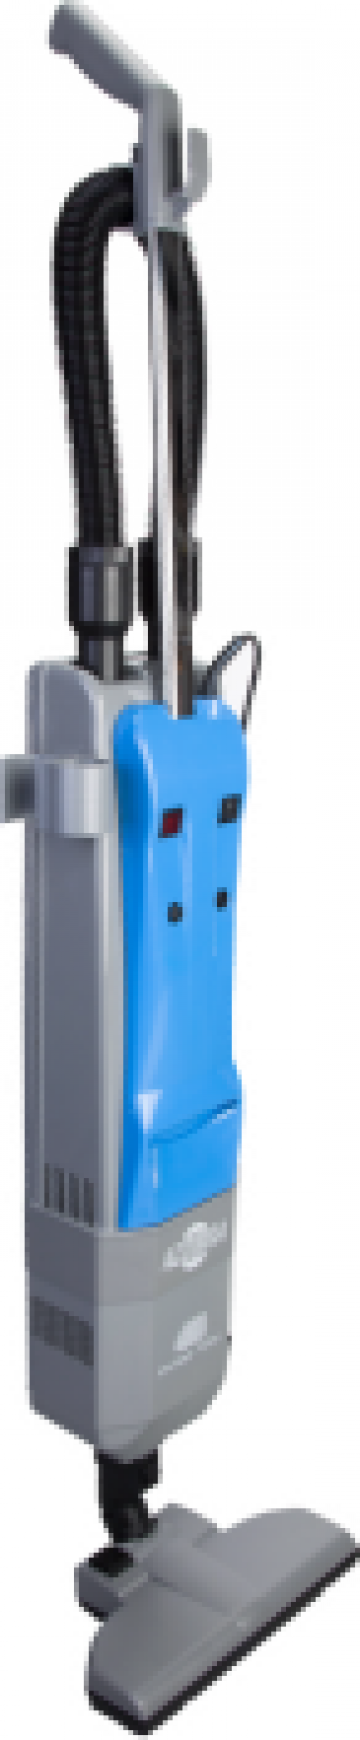 Aspirator batator mochete Azzura de la Tehnic Clean System